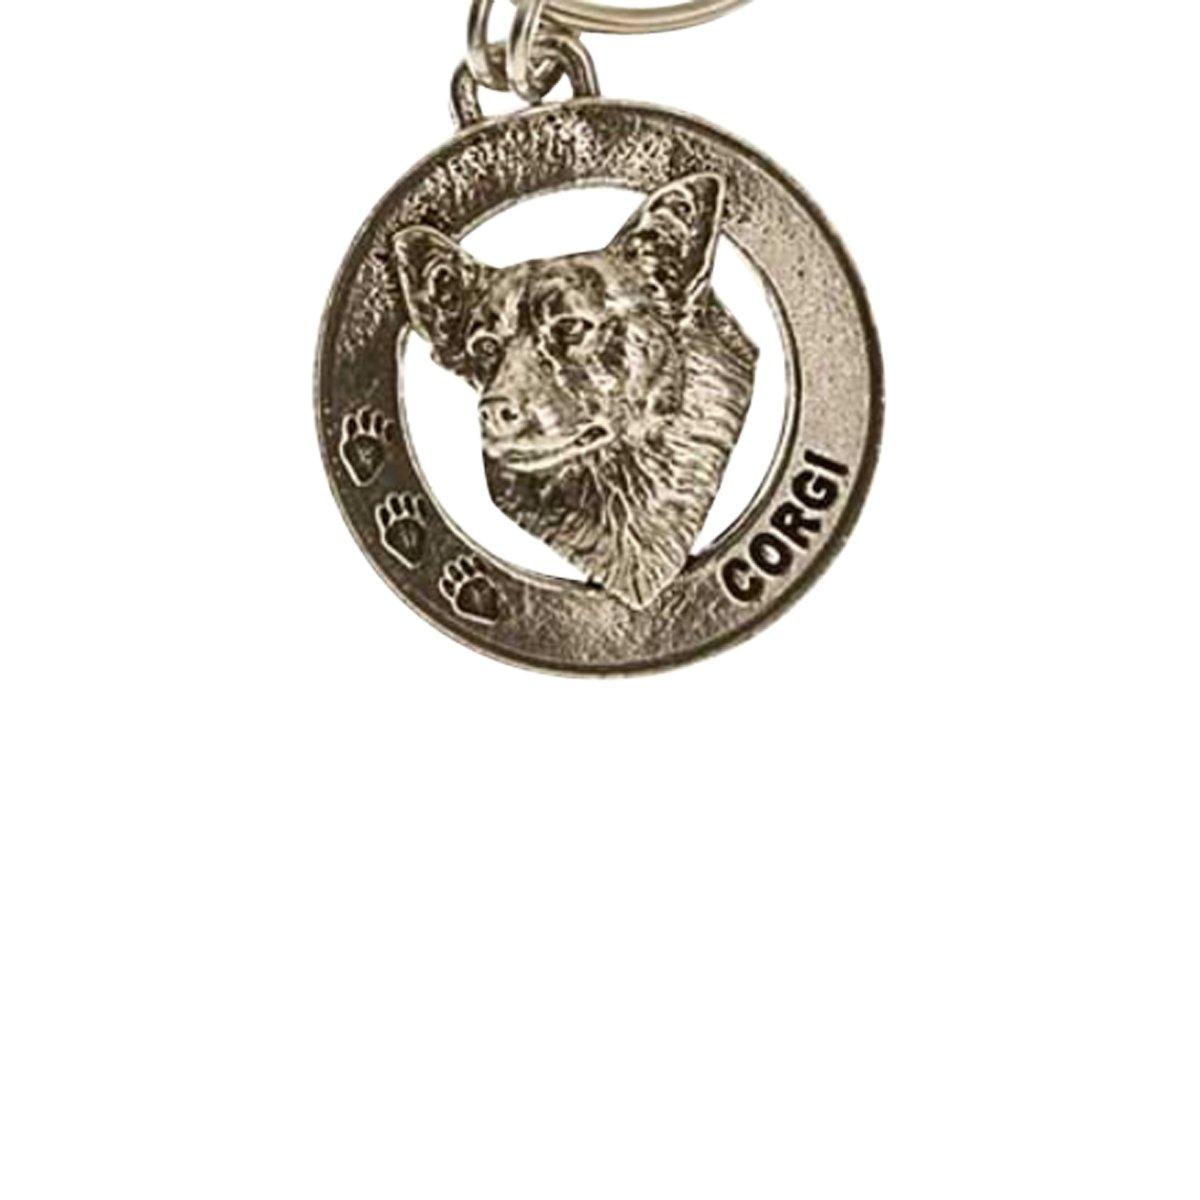 Creative Pewter Designs, Pewter Corgi Key Chain, Antiqued Finish, DK062